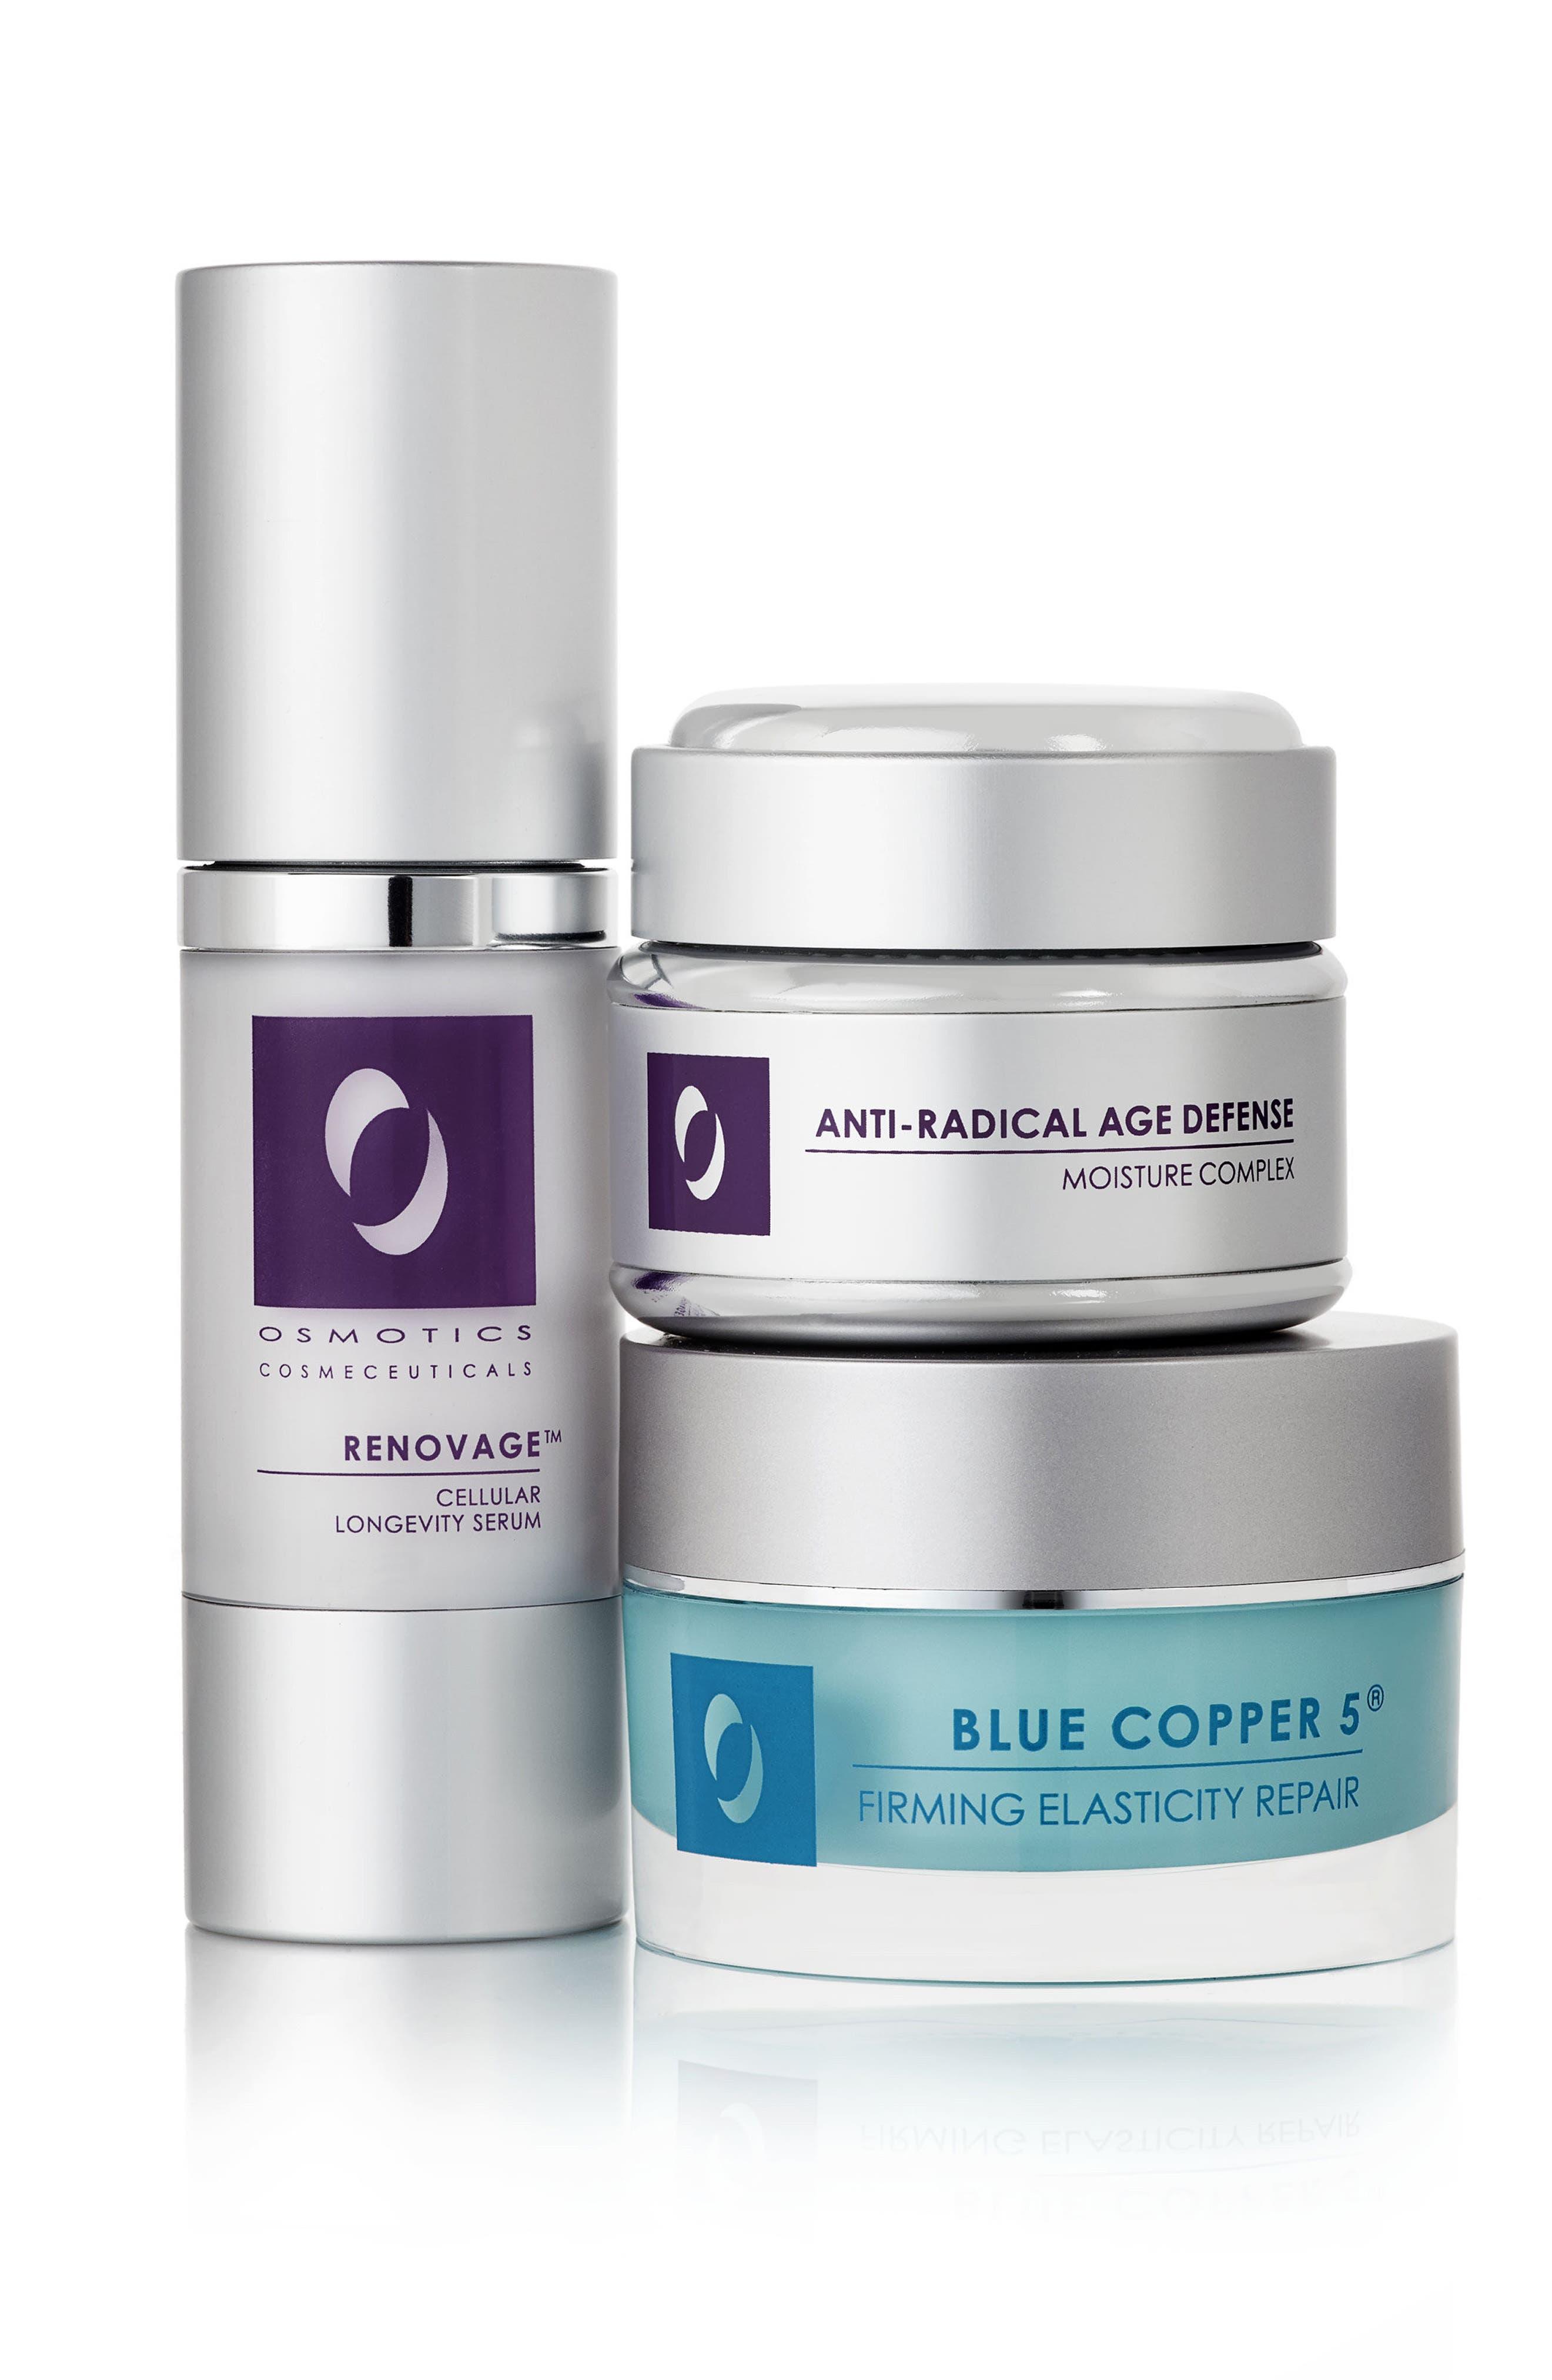 Osmotics Cosmeceuticals Anti-Aging Trilogy ($218 Value)